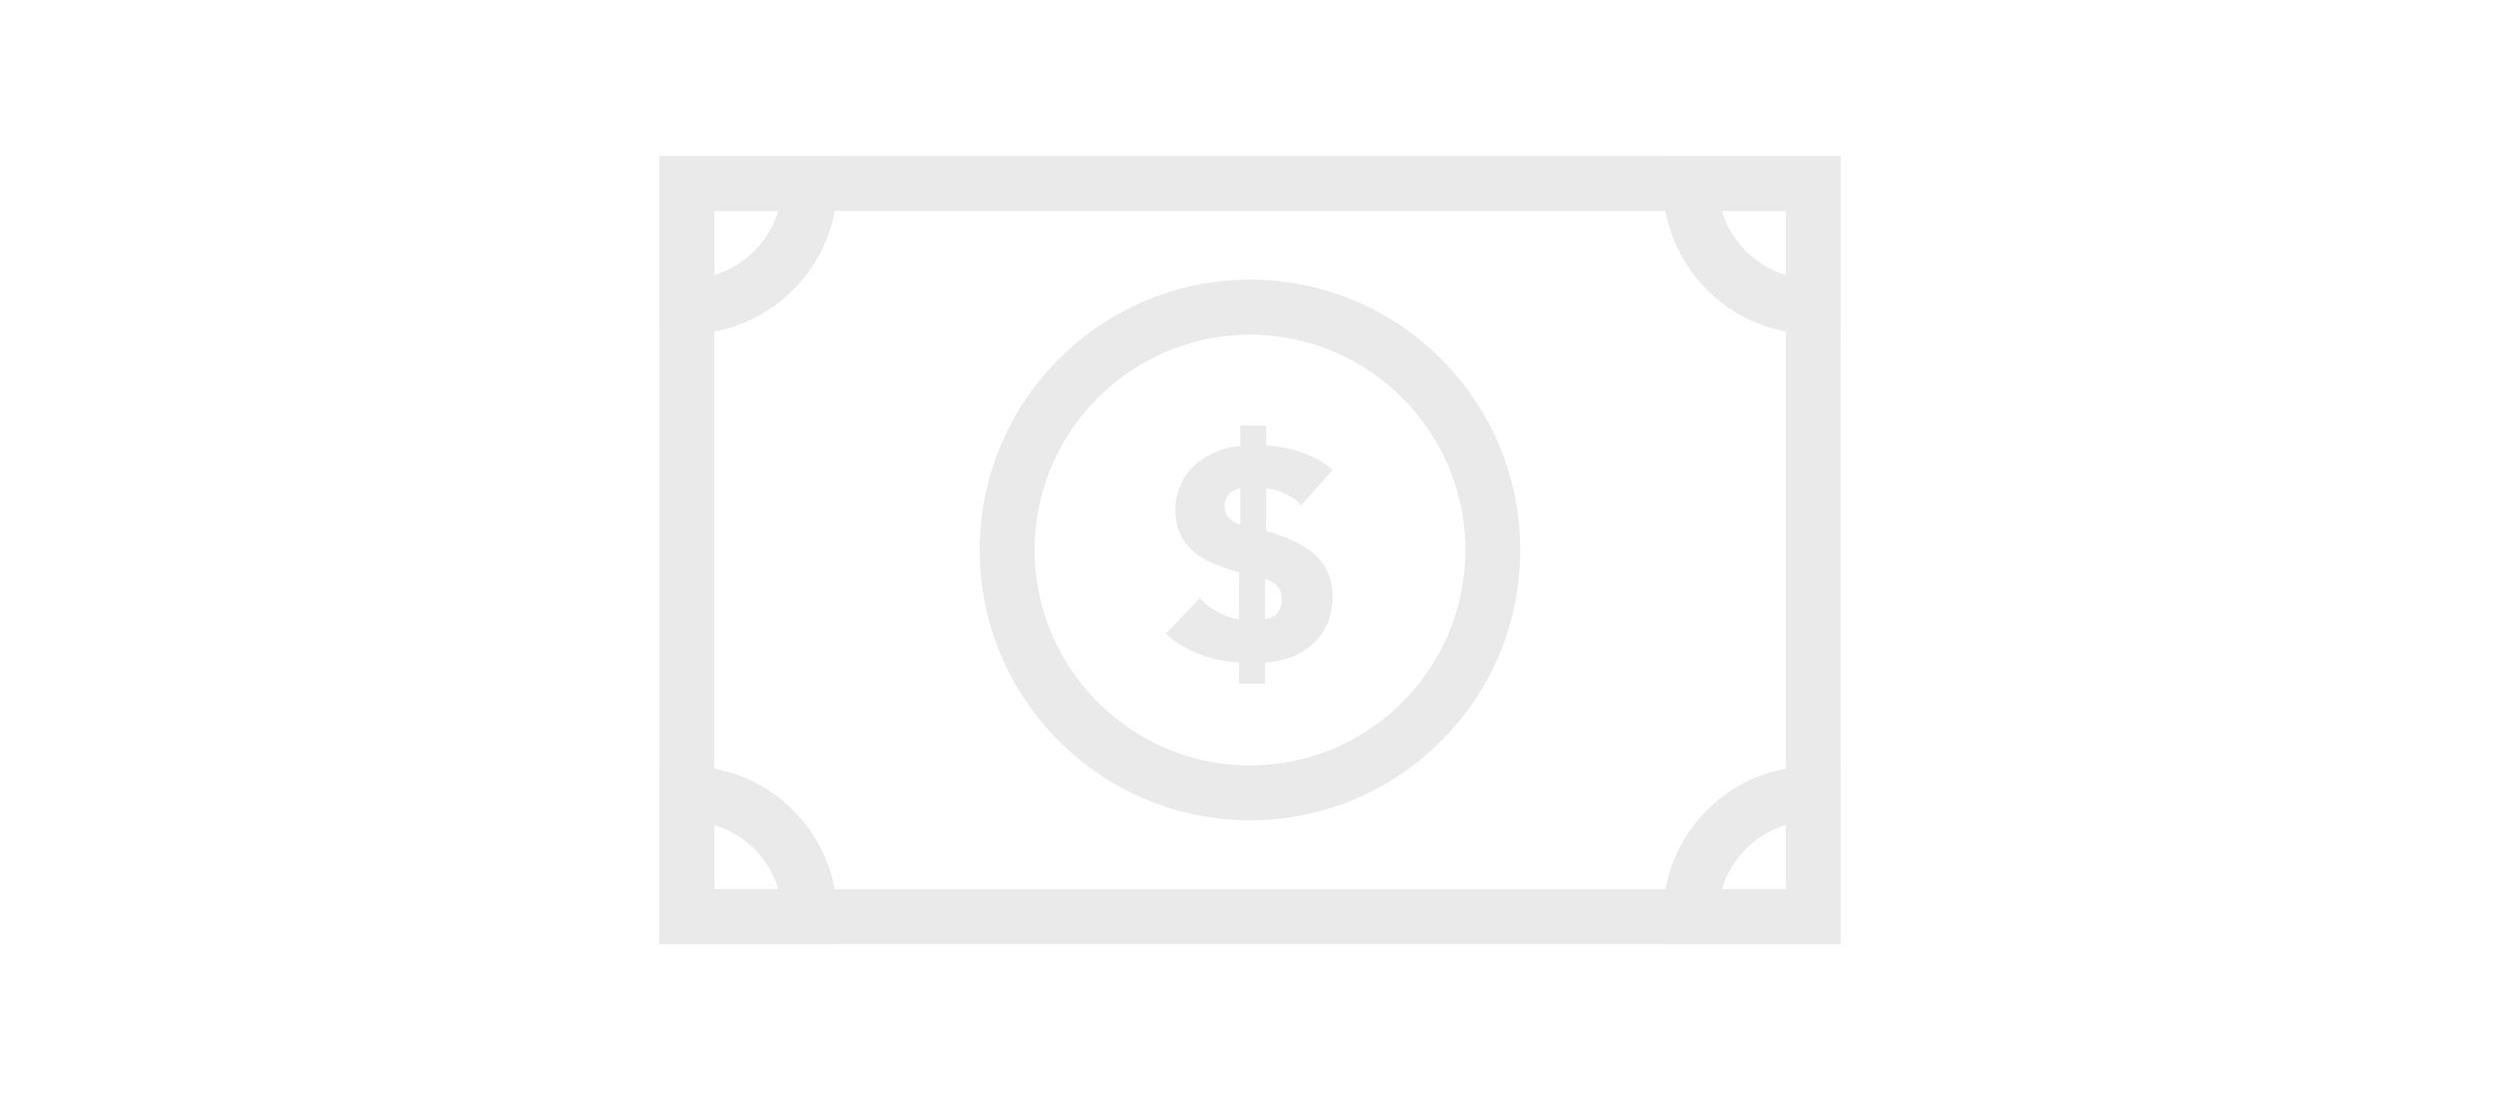 Lowest Cost-01.jpg